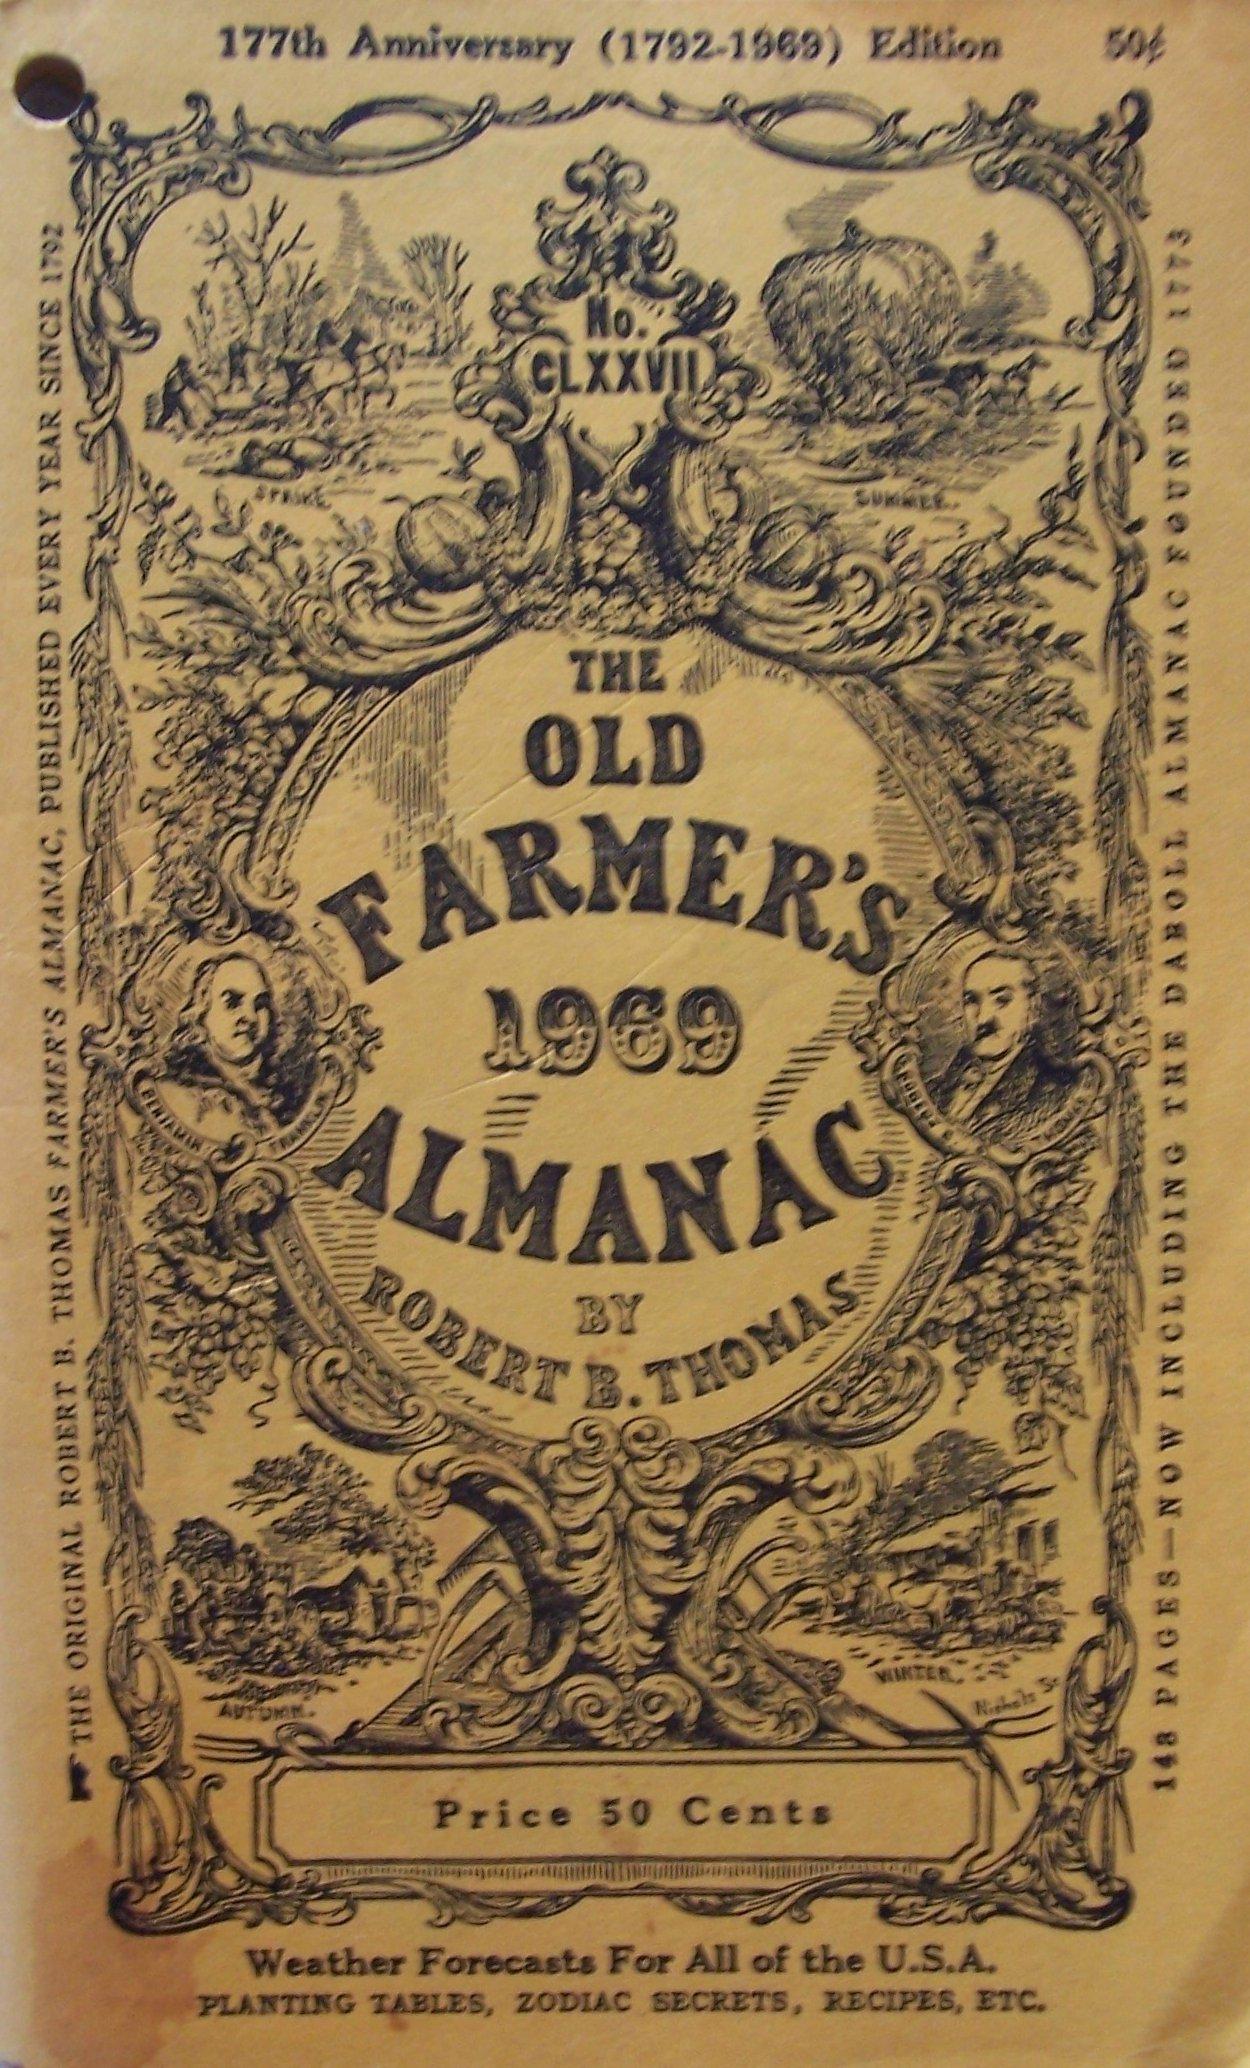 The Old Farmer\'s [ 1969 ] Almanac by Robert B. Thomas (No. CLXXVII ...